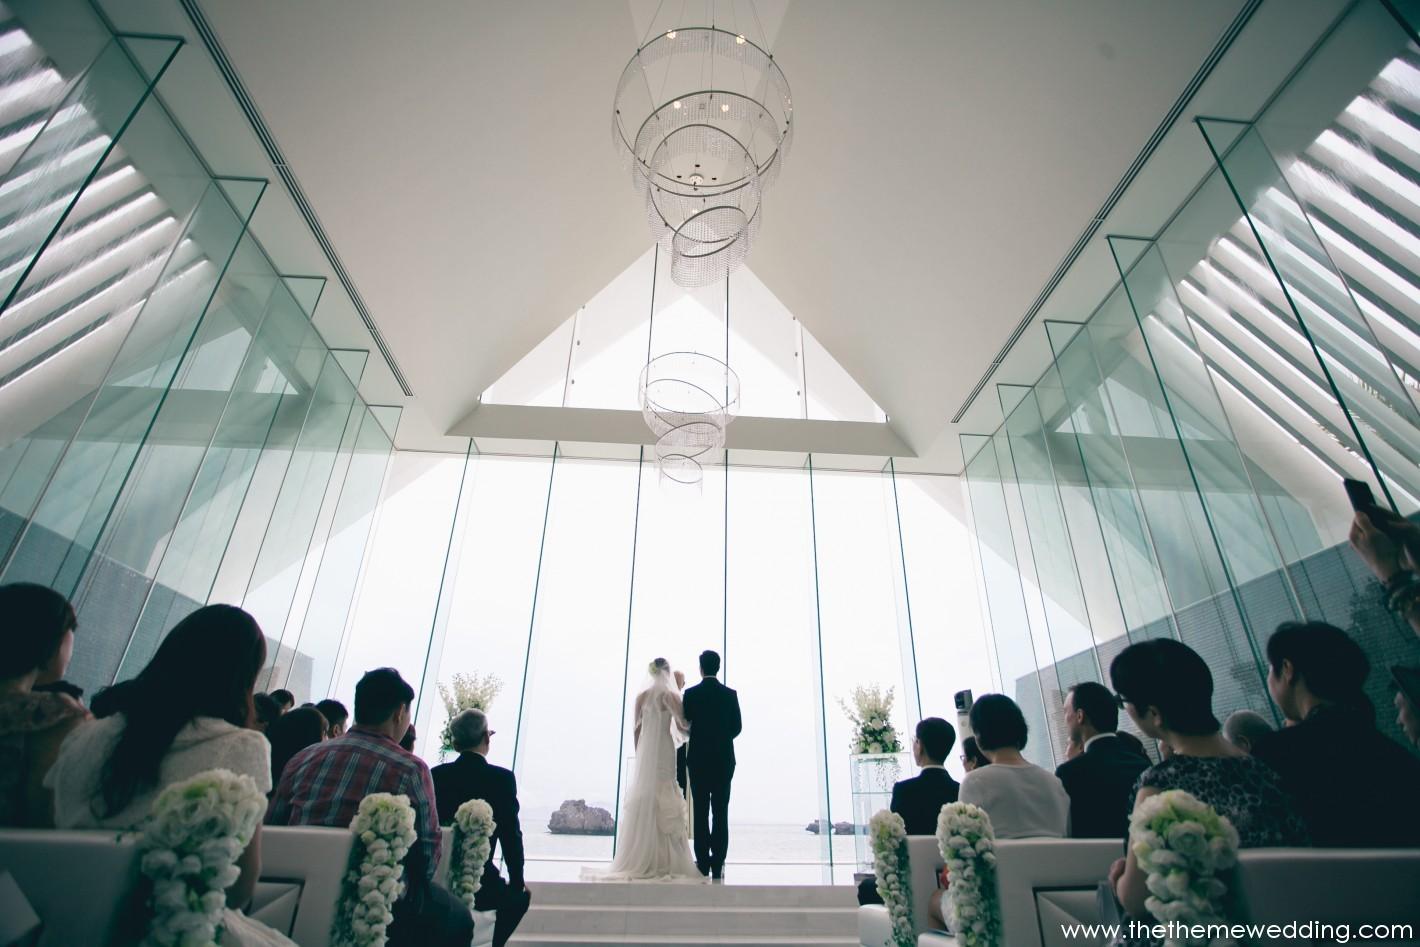 Okinawa - For more, please visit www.thethemewedding.com